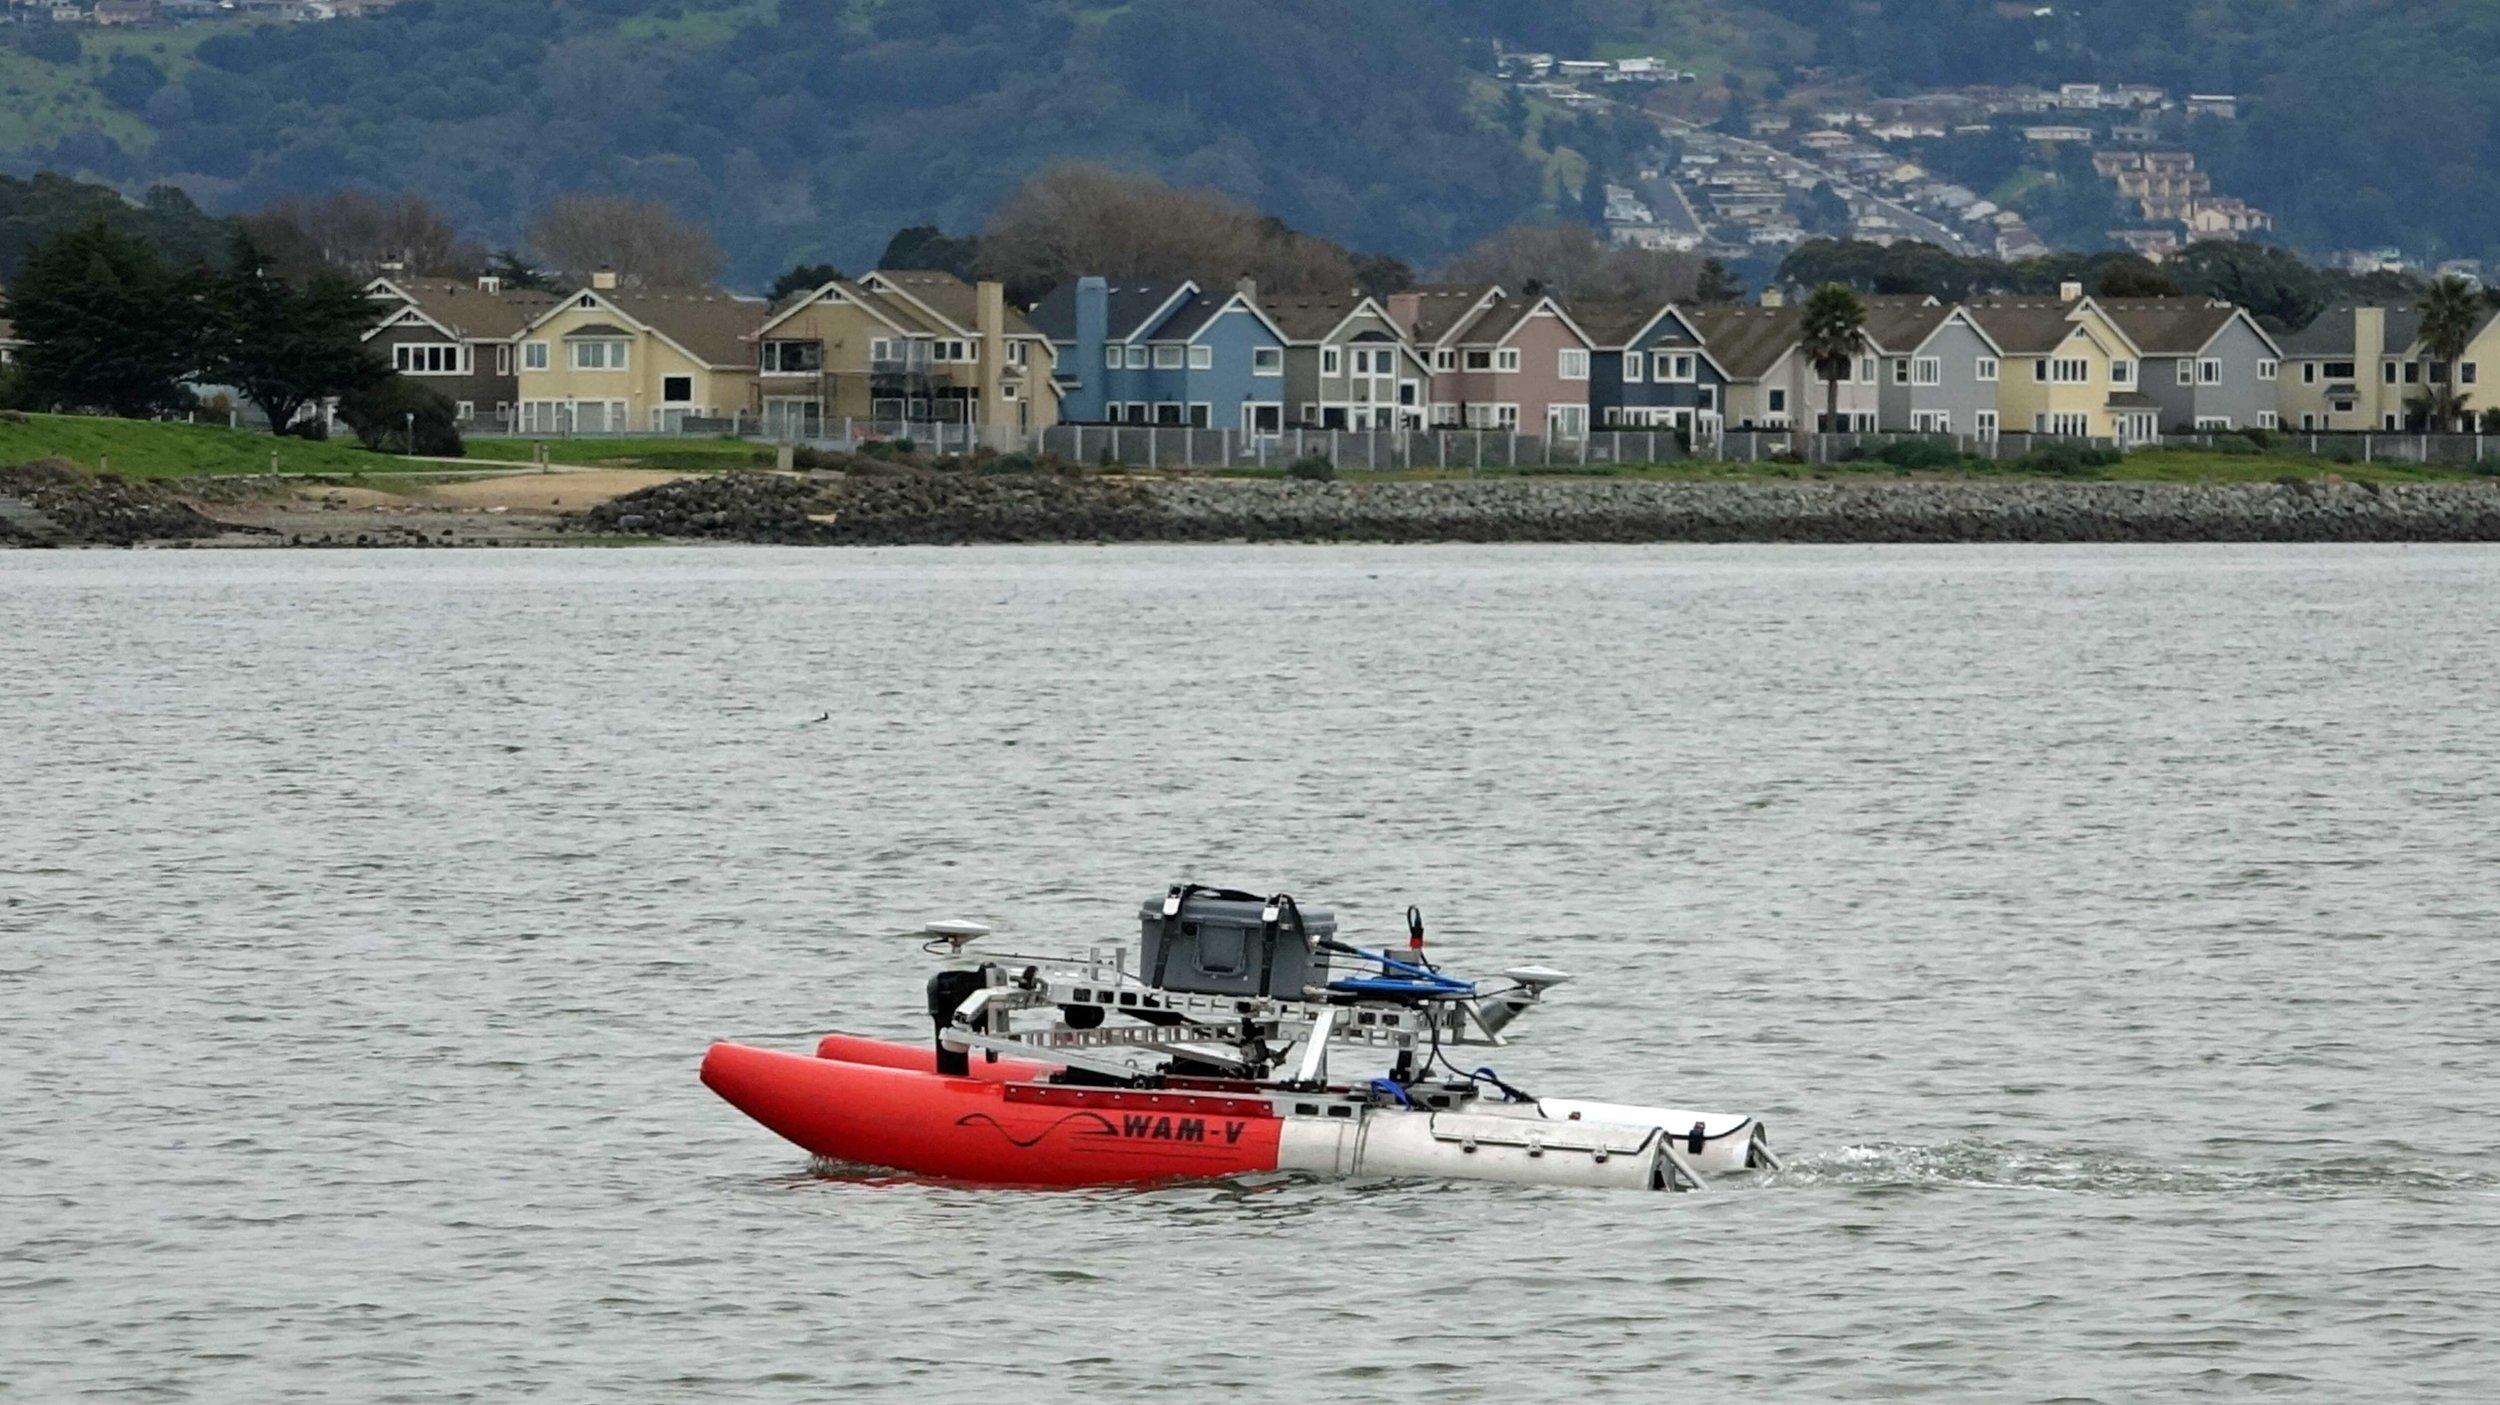 WAM-V 8 ASV for Hydrographic Survey